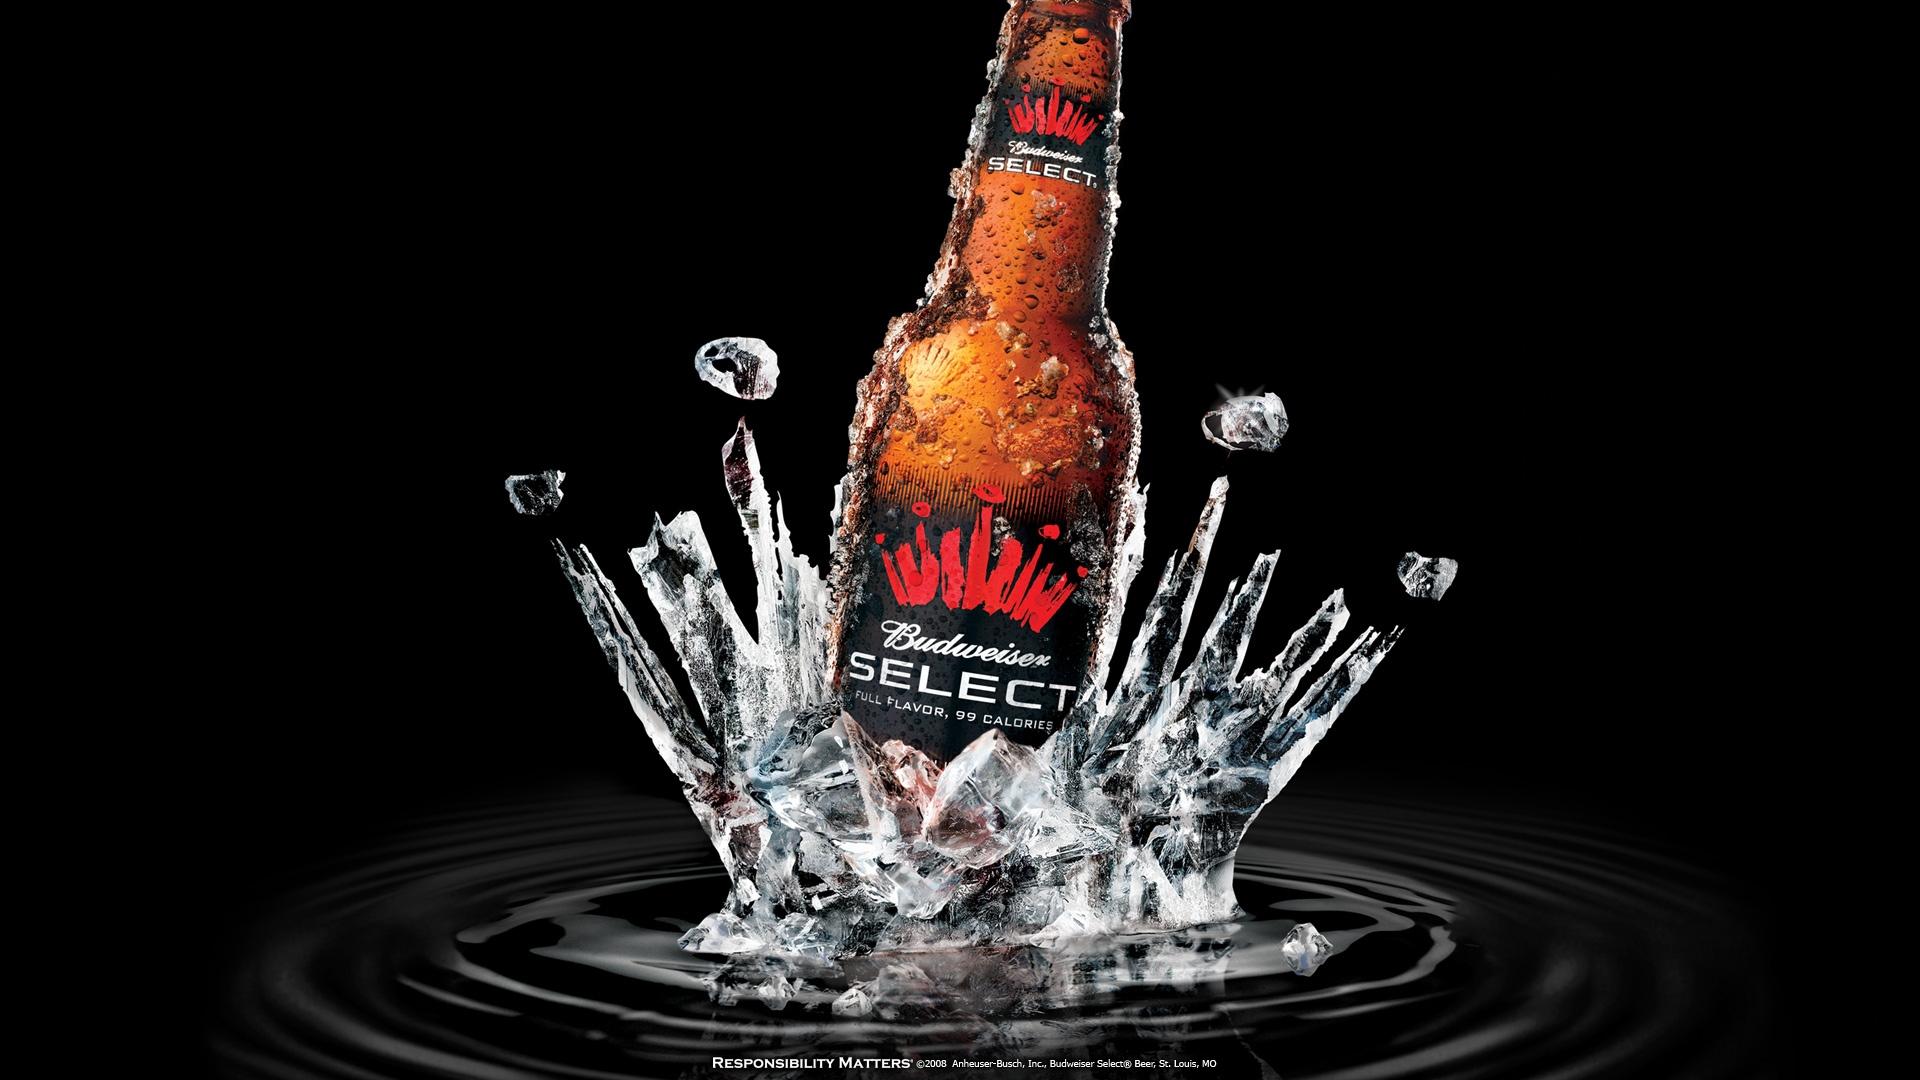 budweiser select | Beer, Budweiser  |Budweiser Select Wallpaper